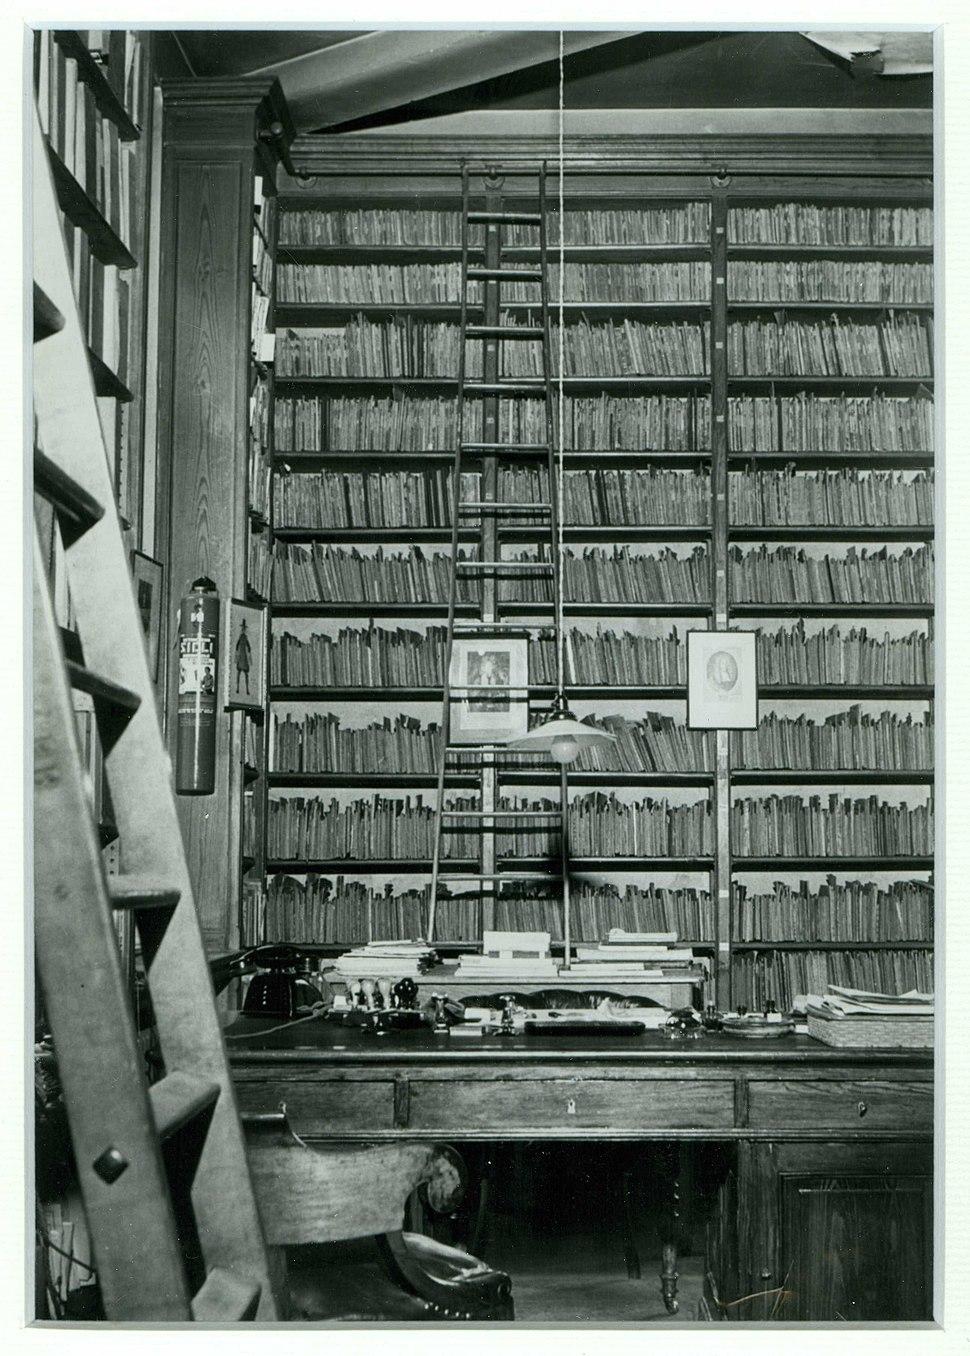 CRB - Biblioth%C3%A8que